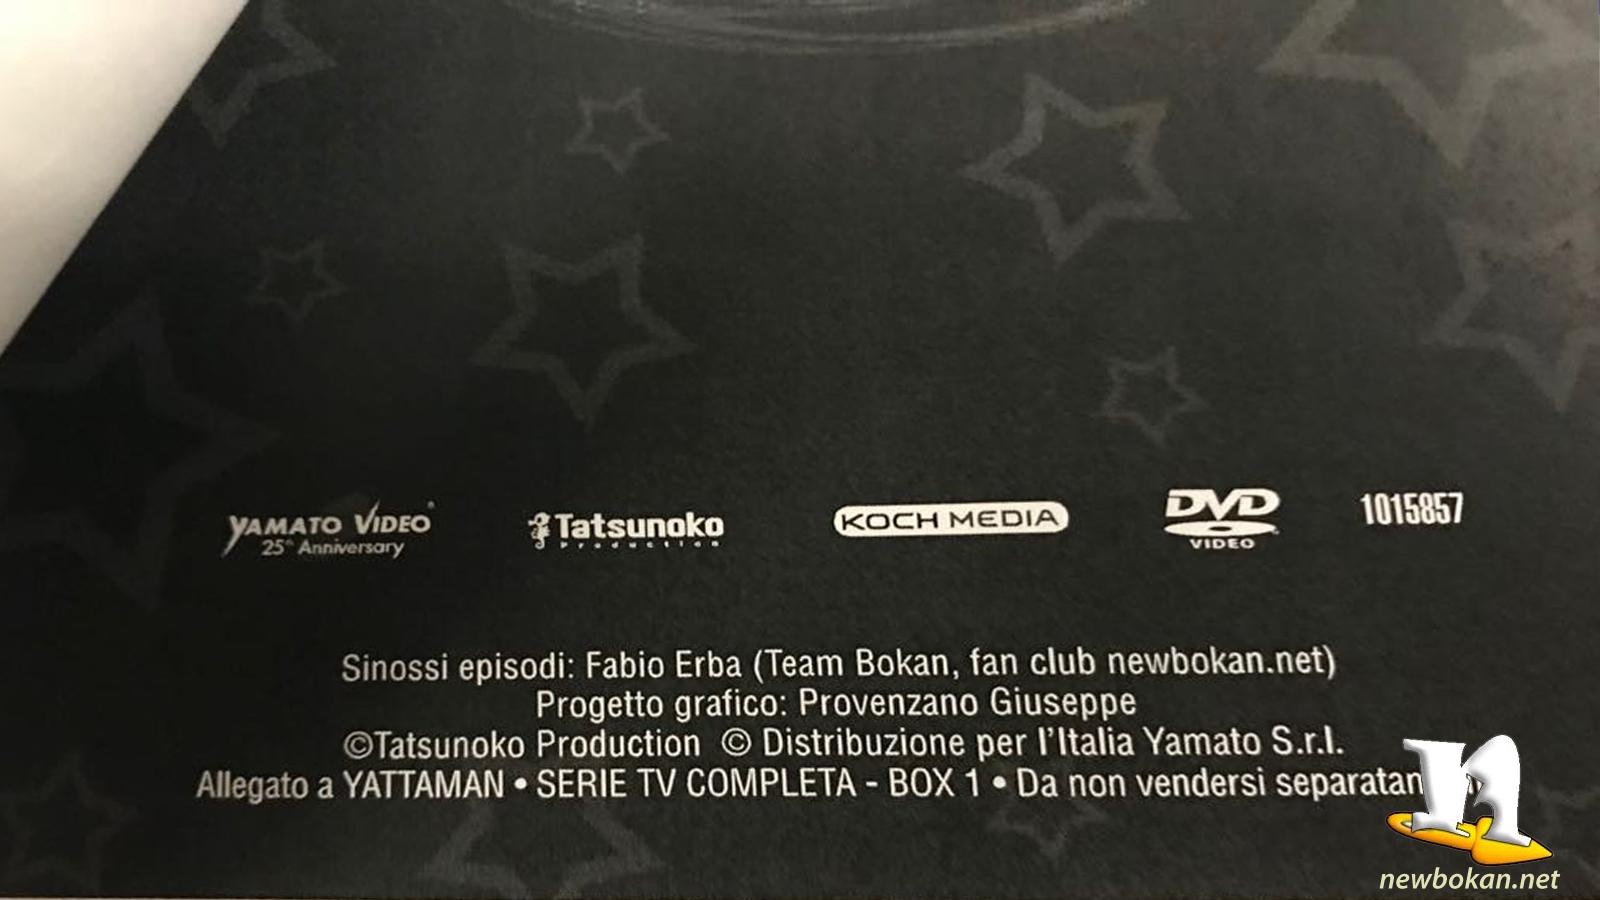 yattaman DVD box1 booklet